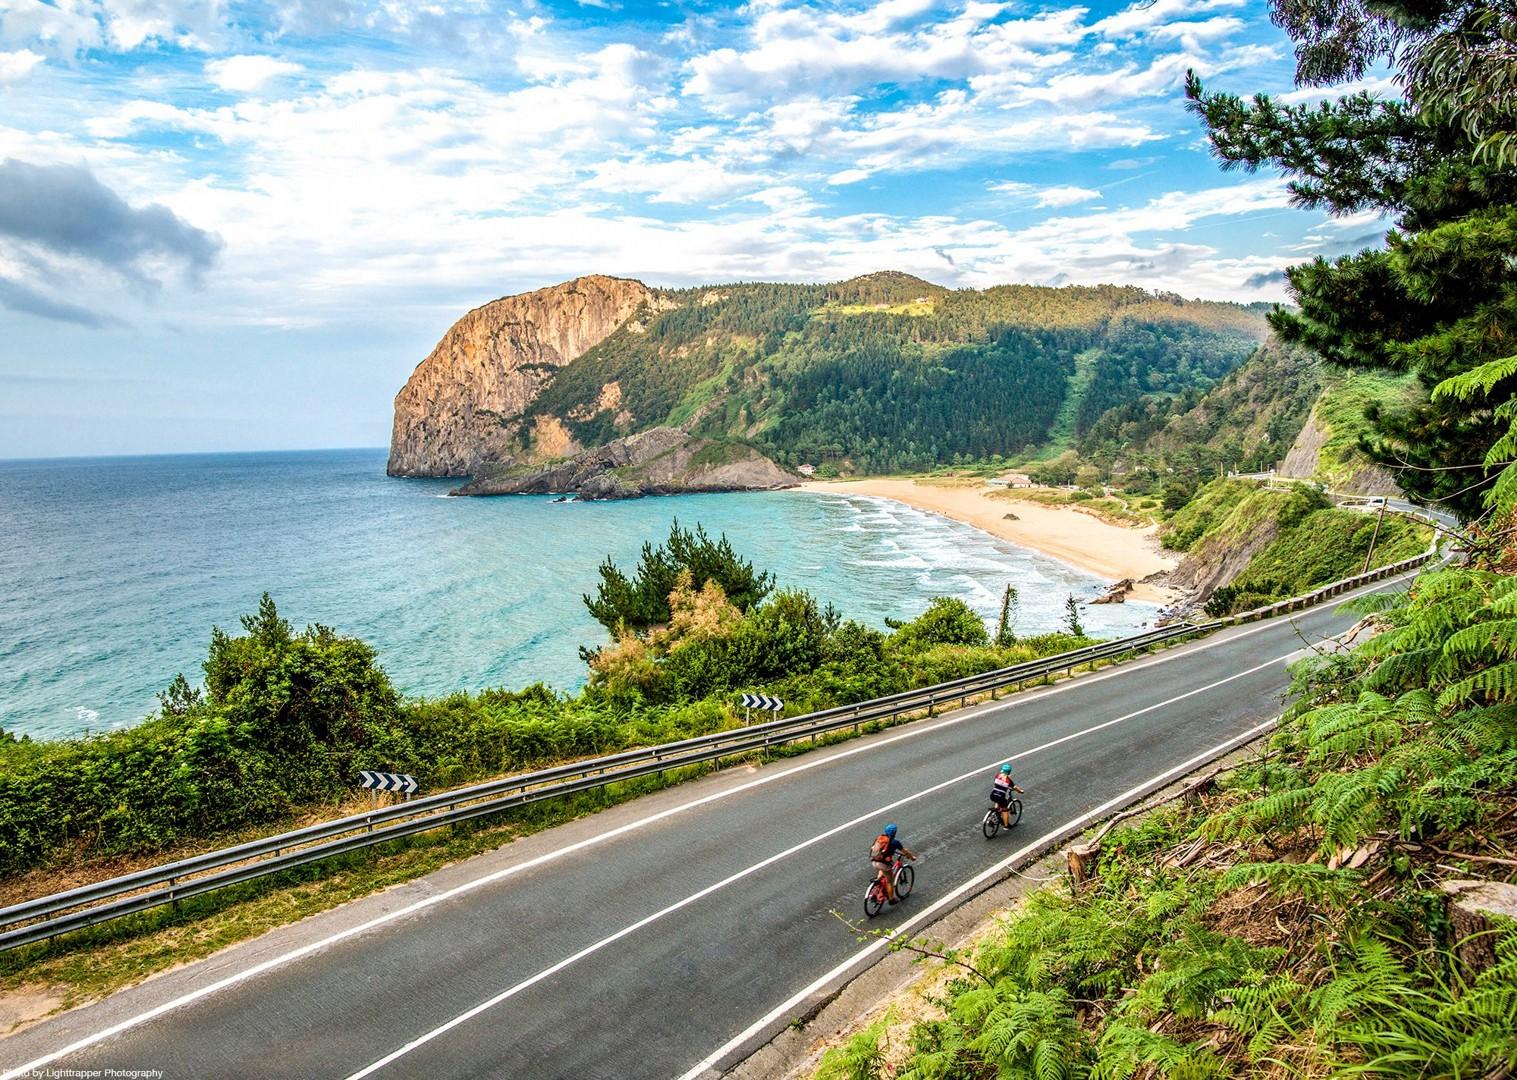 spainedited.jpg - NEW! Spain - Bilbao to San Sebastian - Leisure Cycling